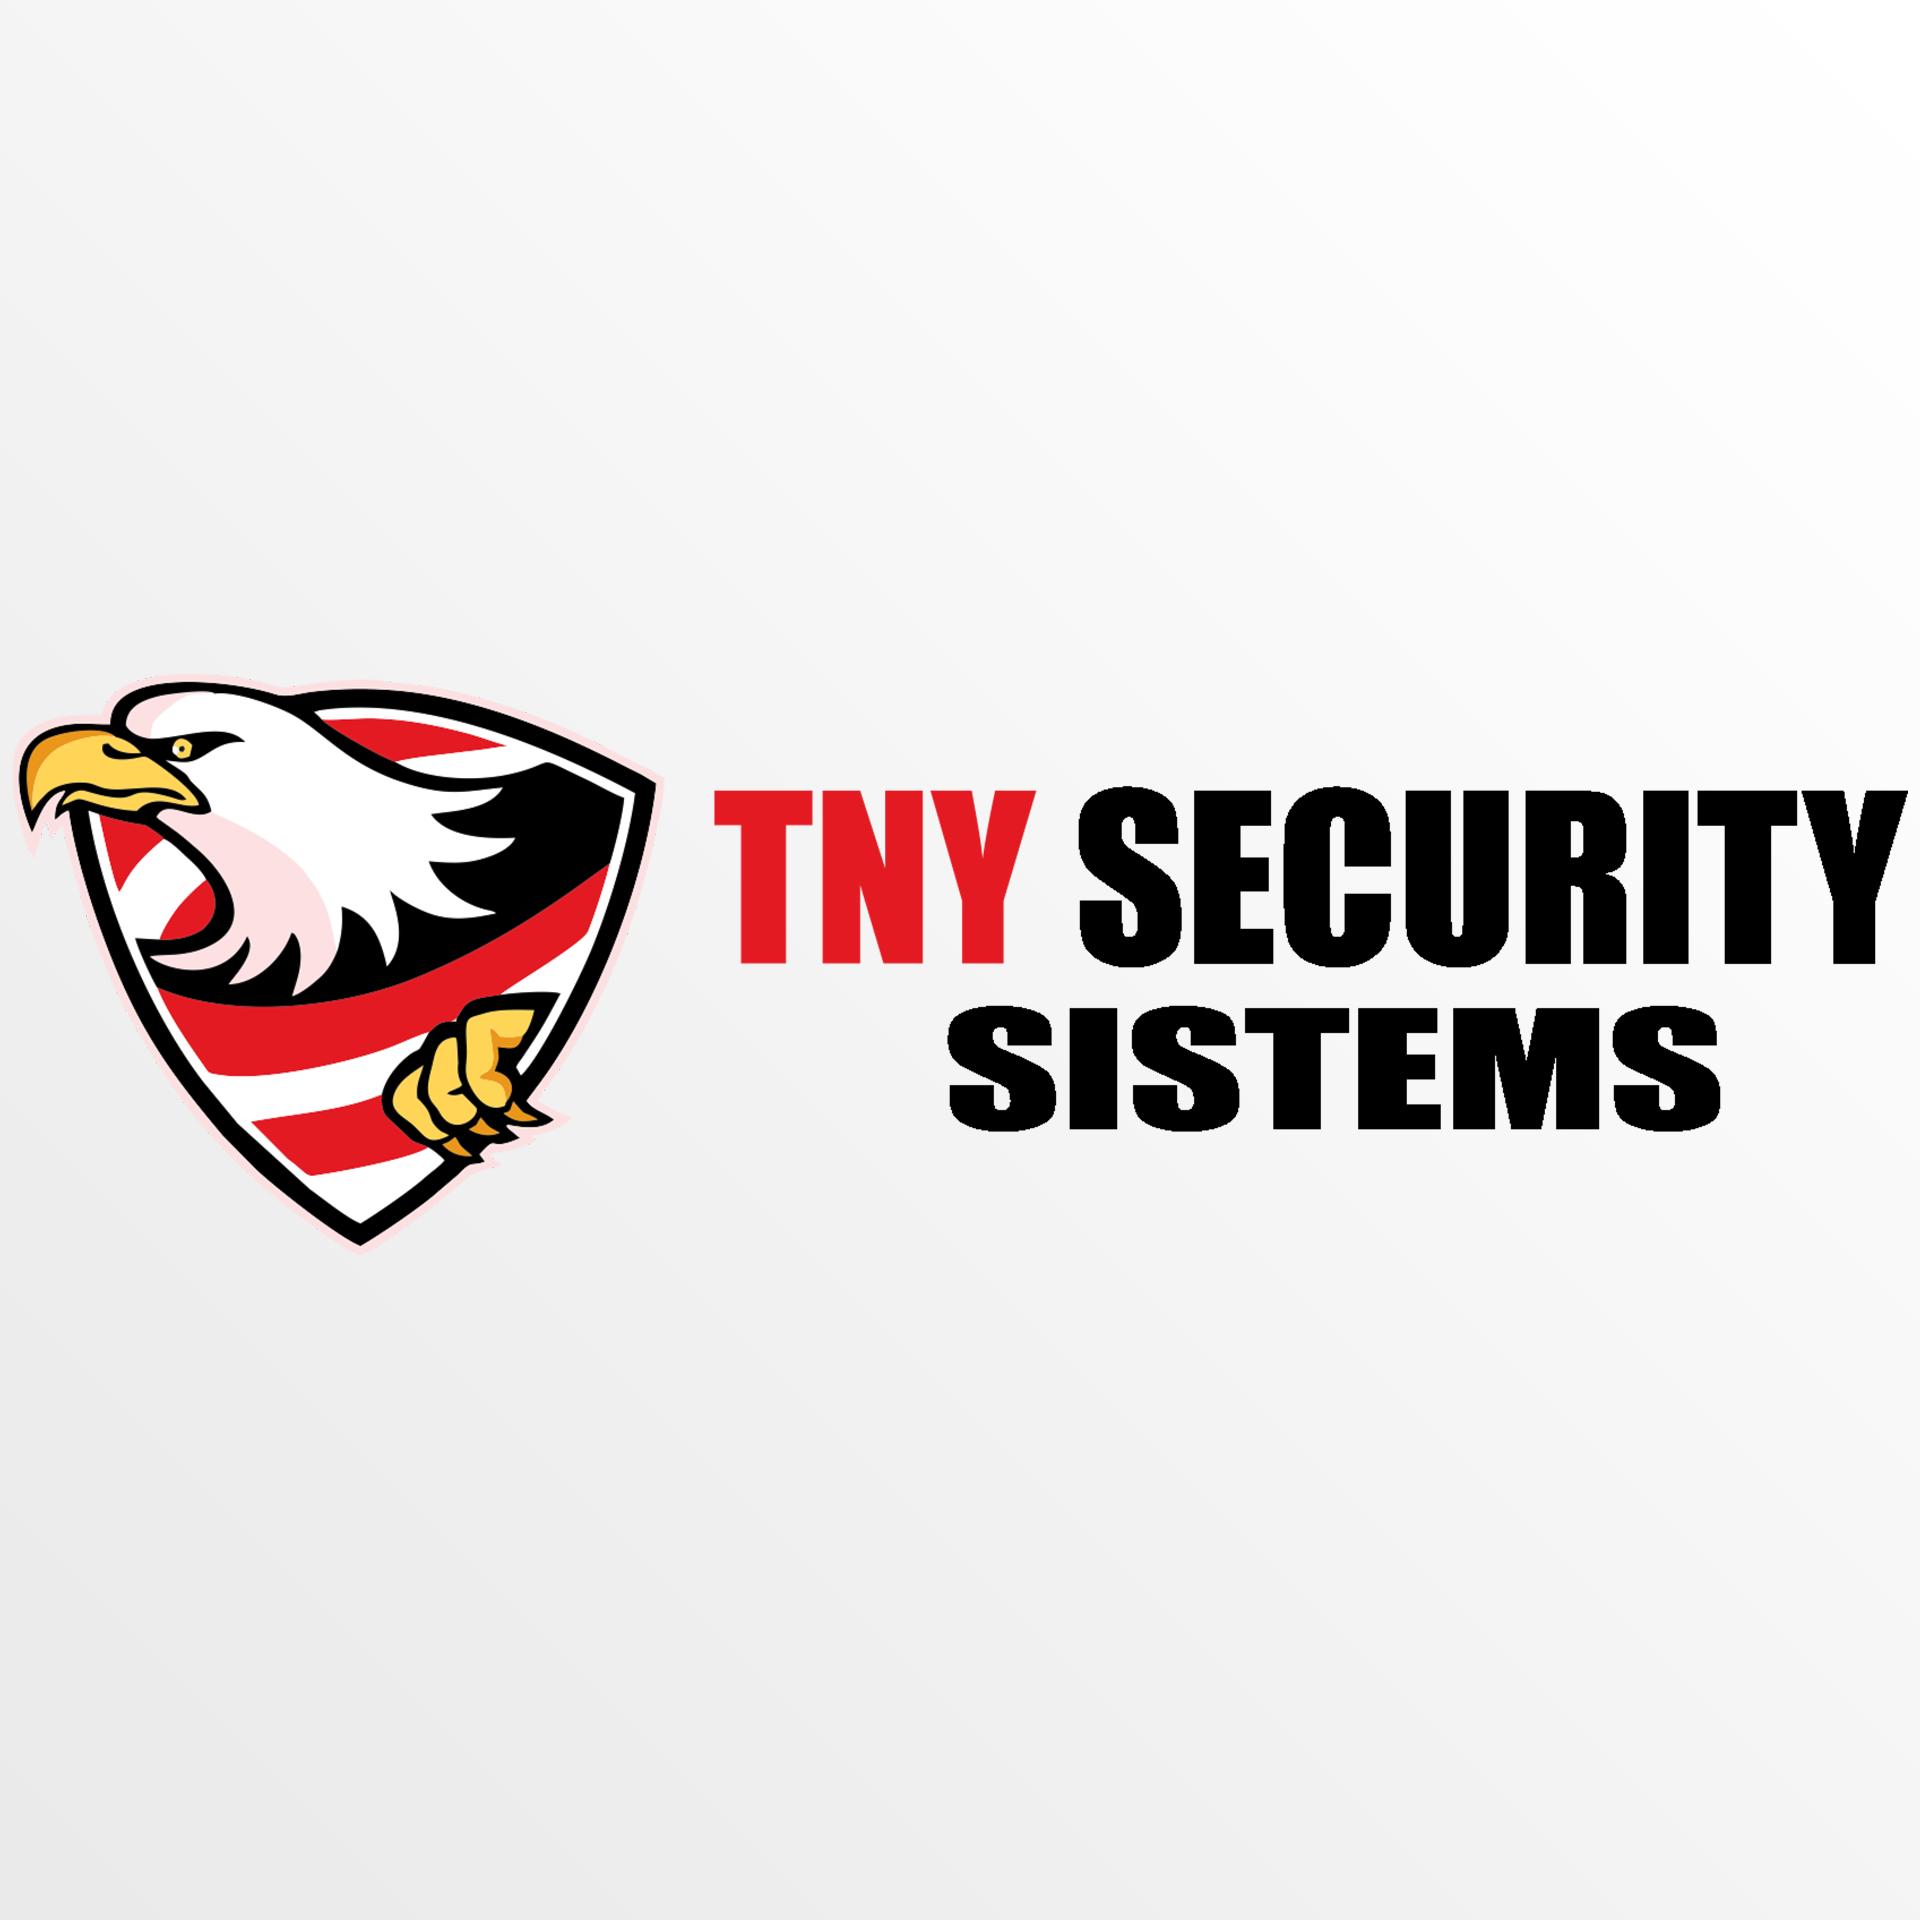 logo - TNY security 5